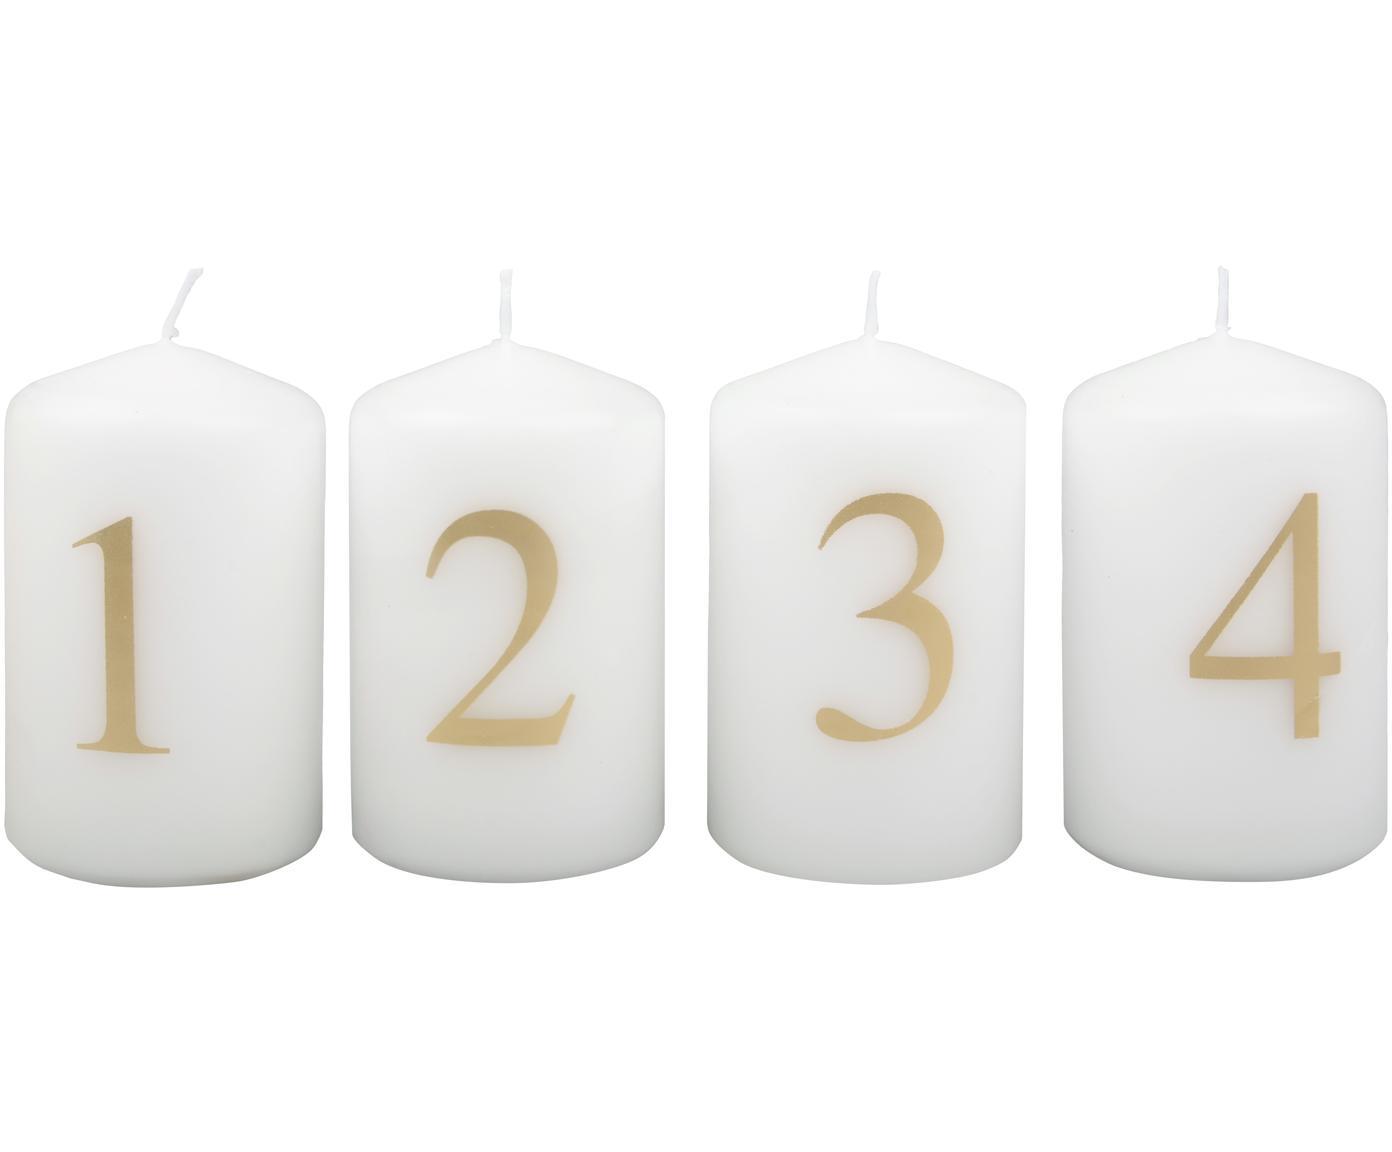 Set de velas de Adviento Aven, 4pzas., Parafina, Blanco, dorado, Ø 6 x Al 9 cm